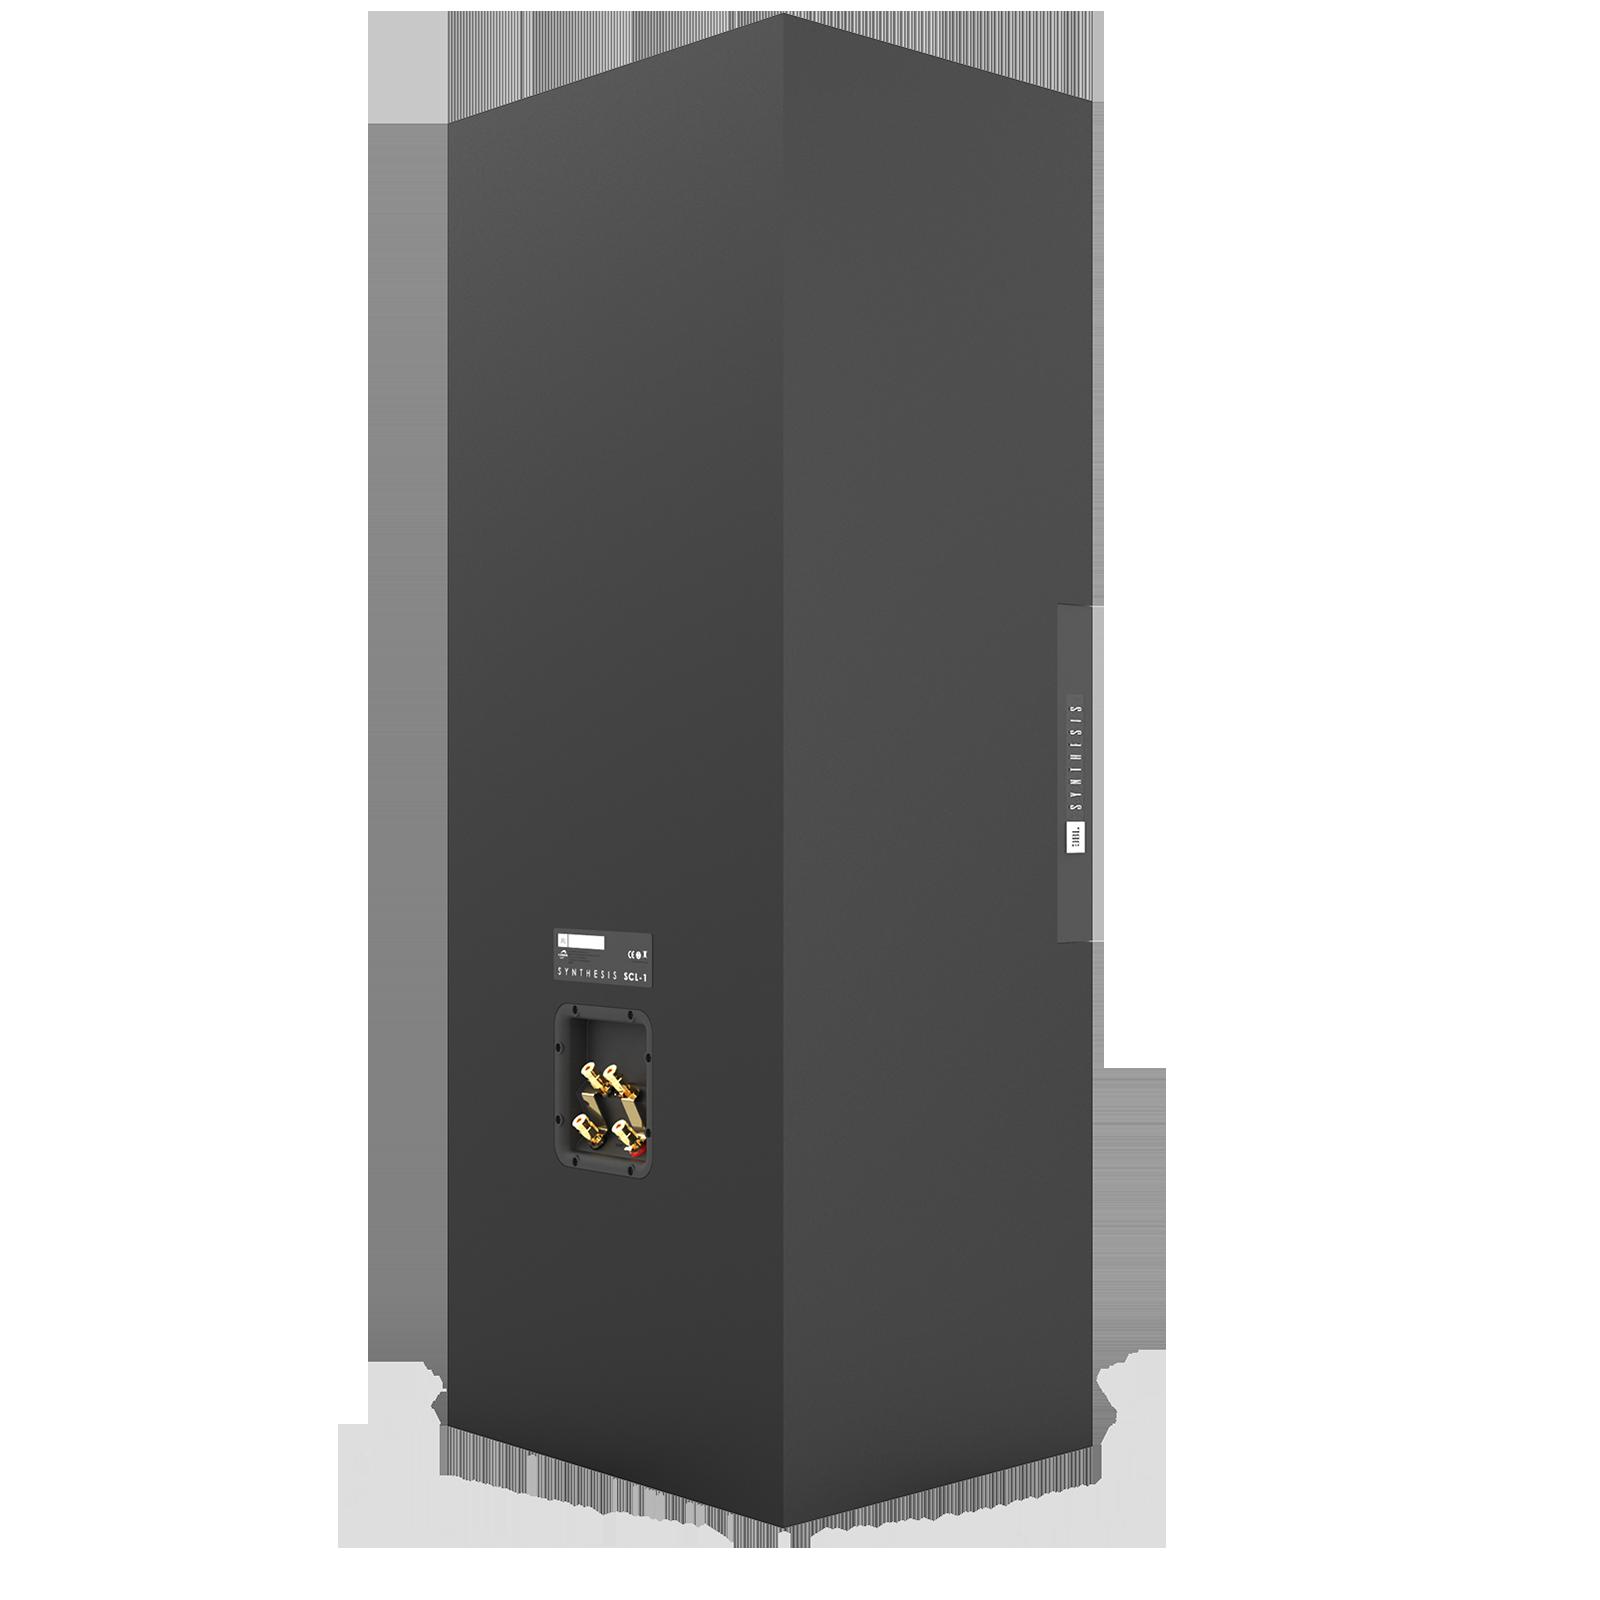 SCL-1 - Black - 2-Way Dual 12-inch (300mm) Custom LCR Loudspeaker - Back